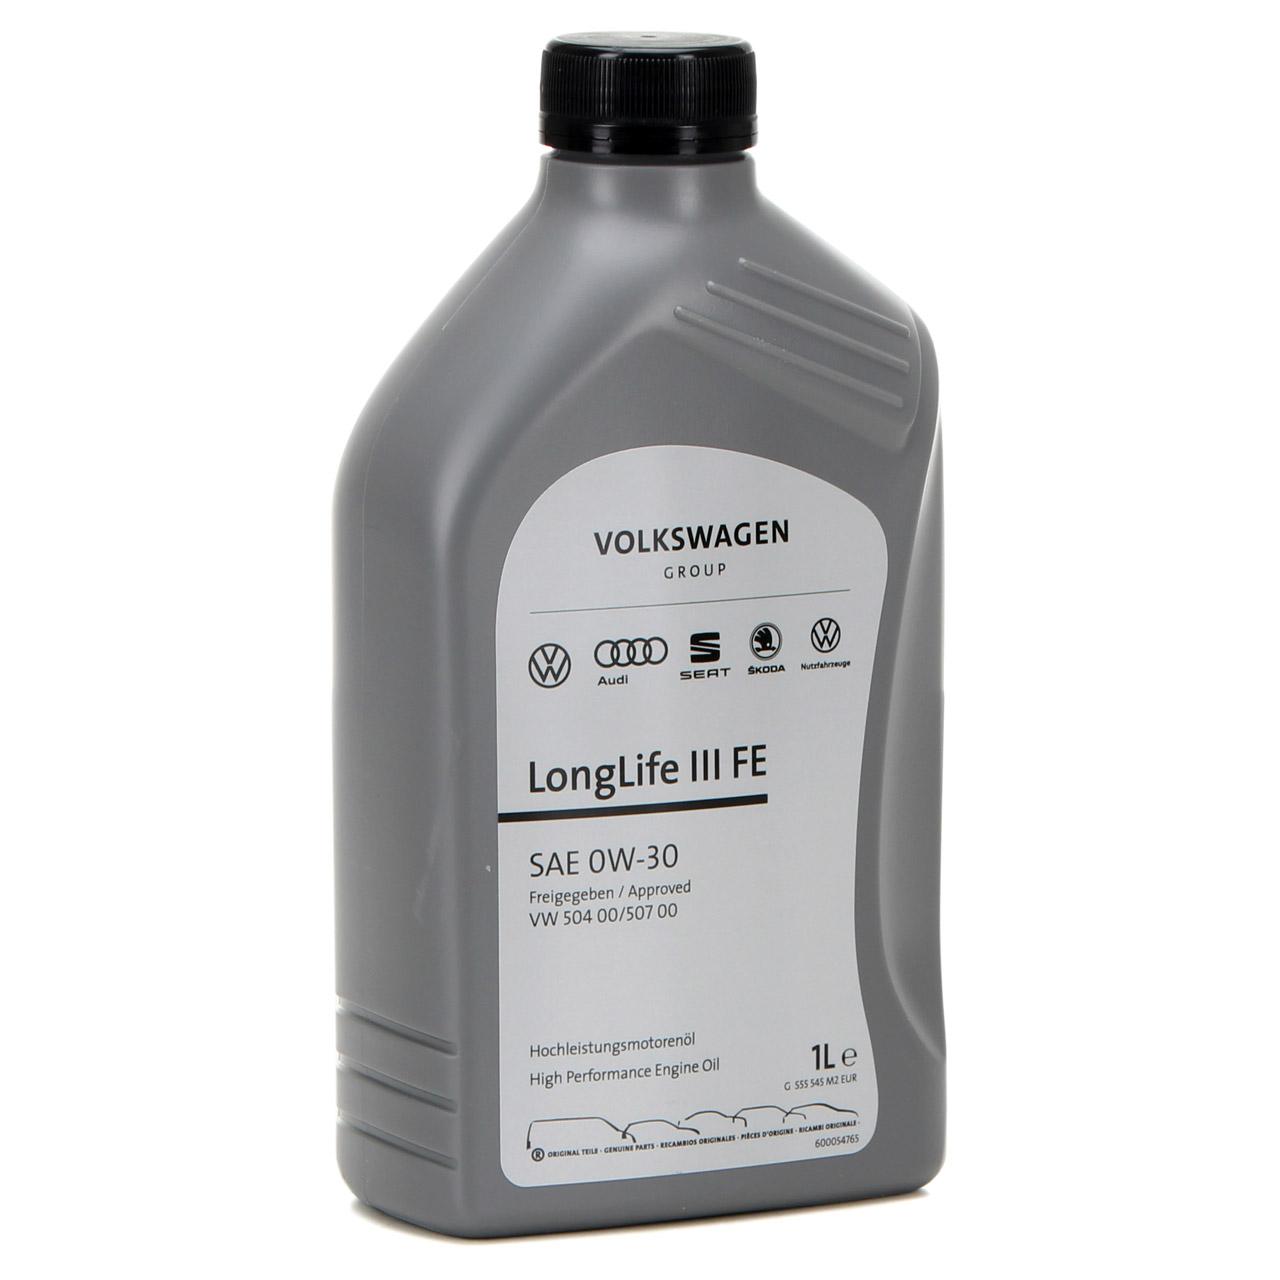 ORIGINAL VW Motoröl Öl 0W30 LONGLIFE III FE 504.00 507.00 GS55545M2 - 1 Liter